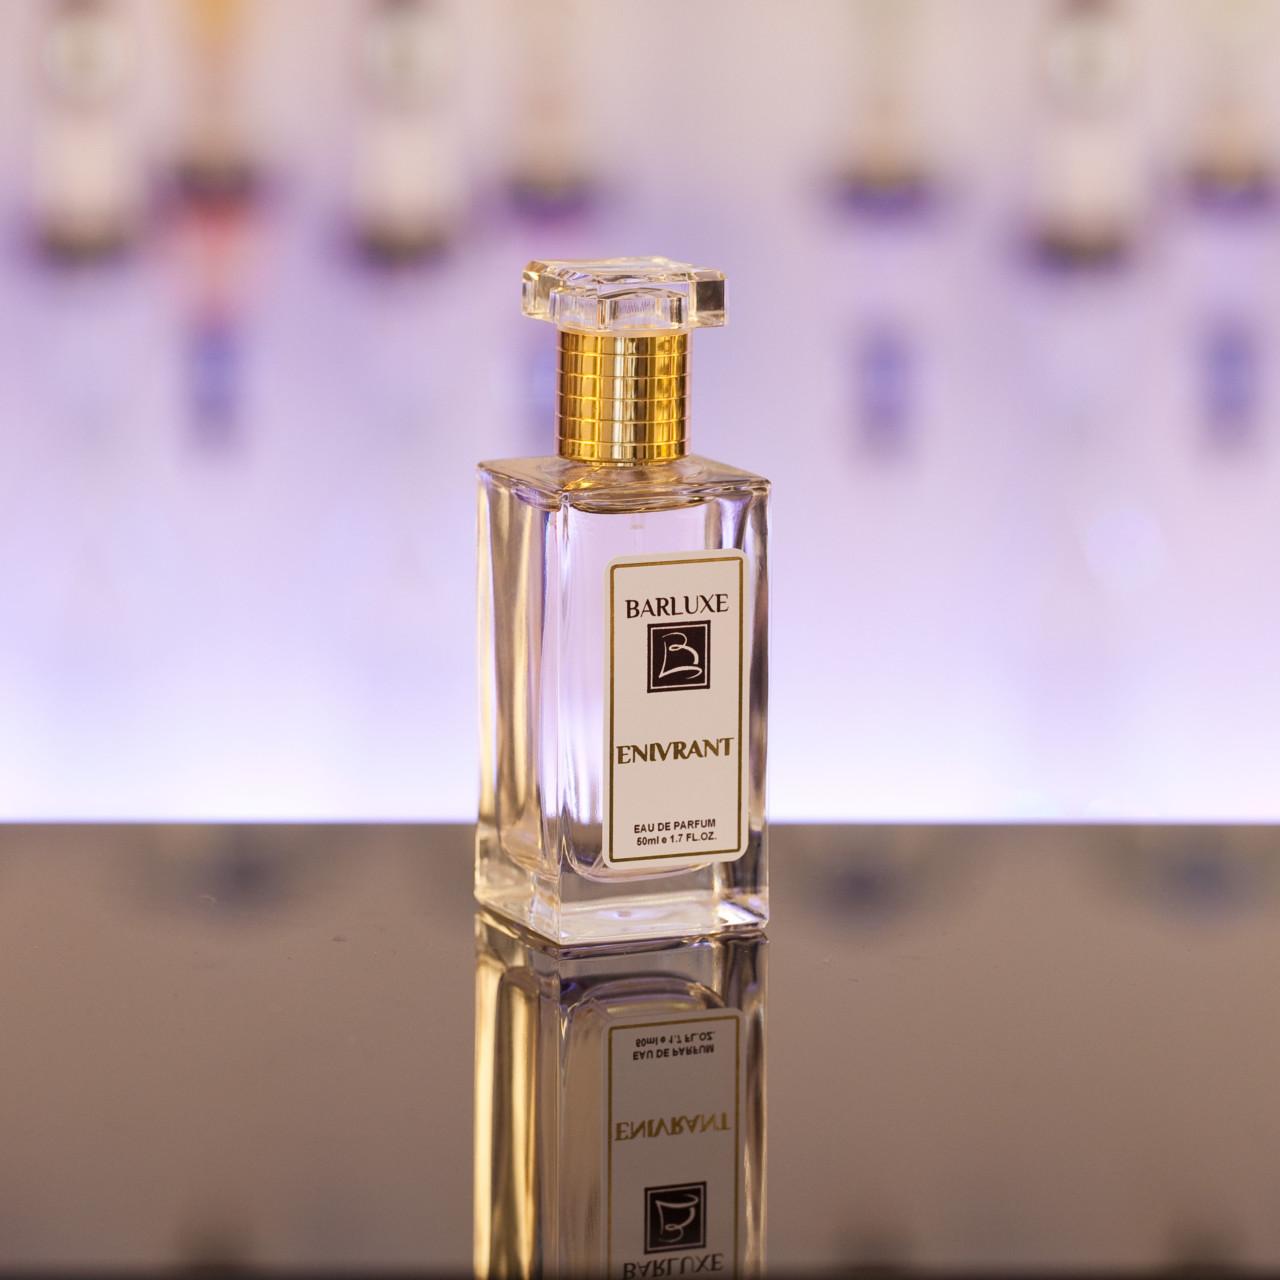 herren-parfum-dupe-double-duft-duftzwilling-enivrant-2